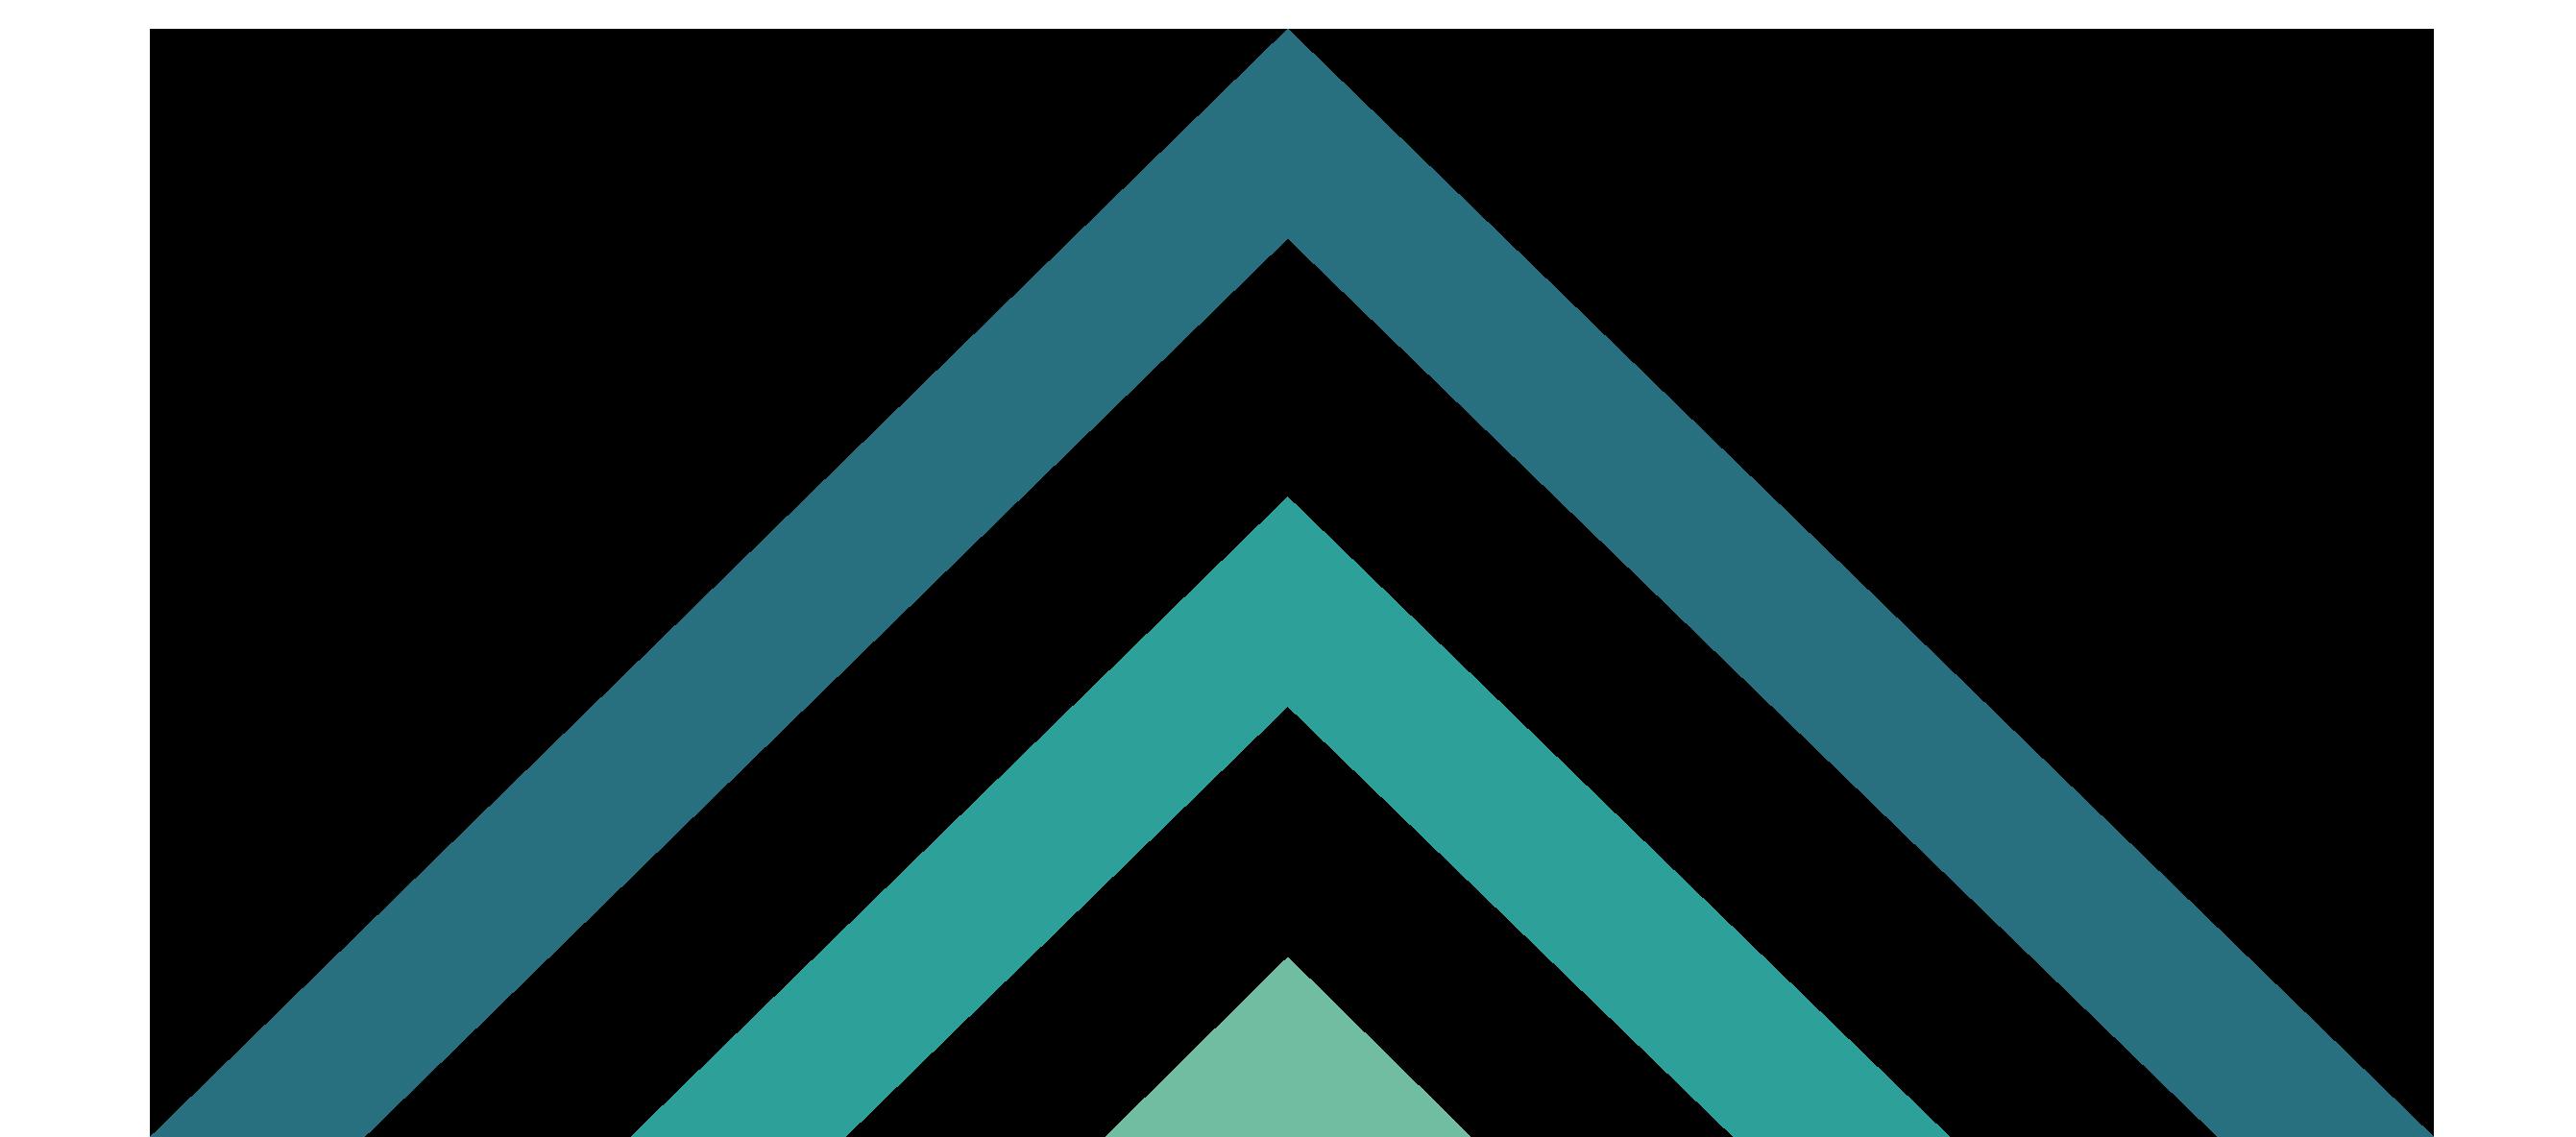 AEDC triangles